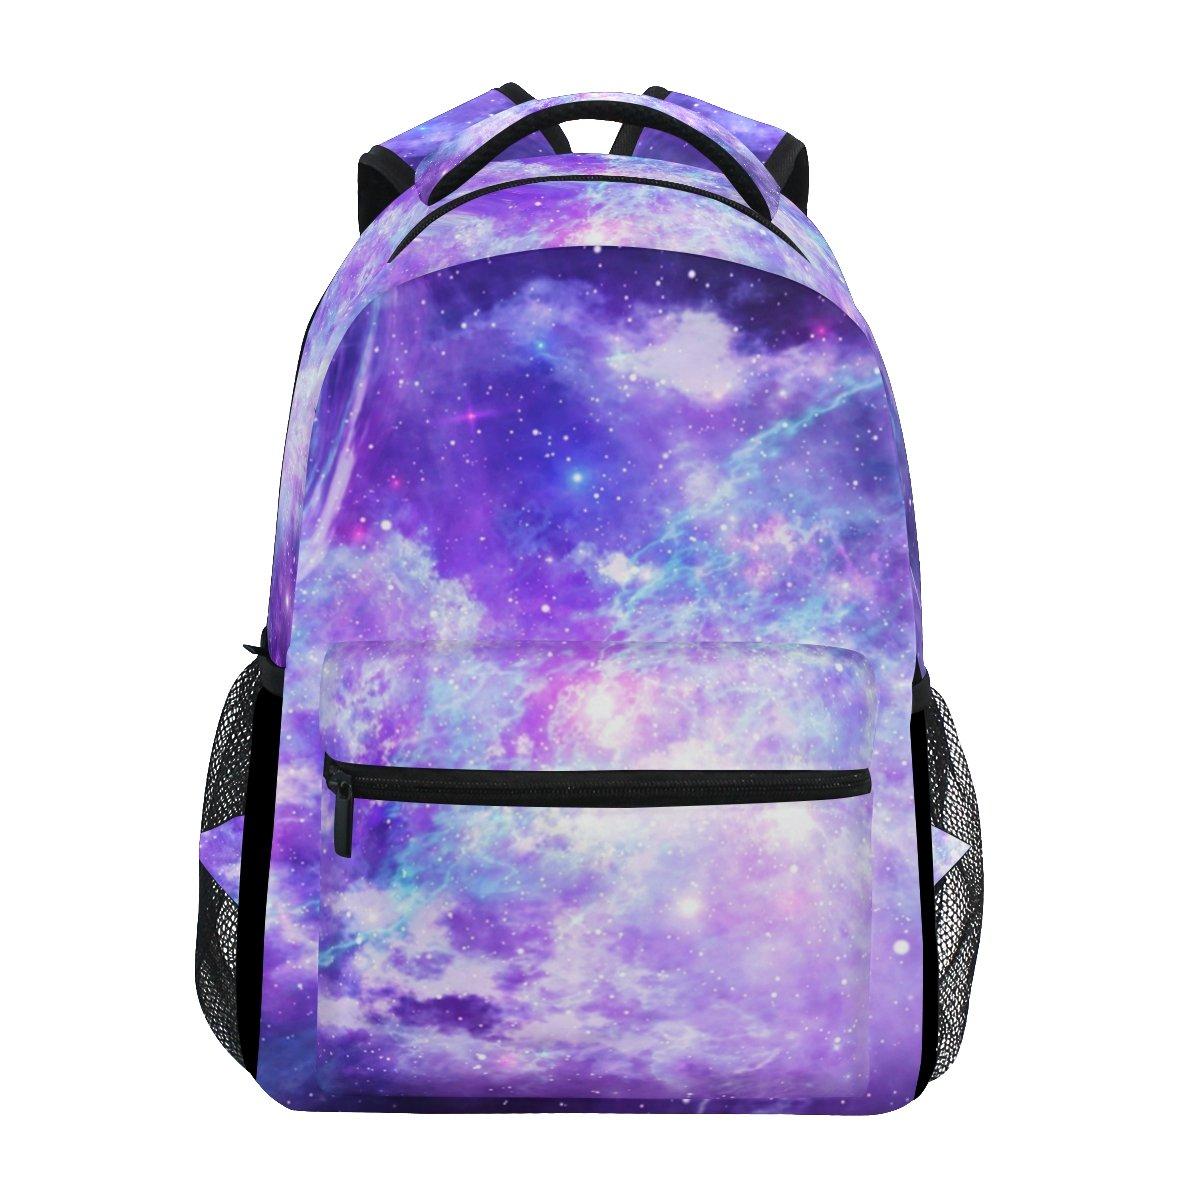 ahomy Universe Galaxy Stars Nebulaバックパックガールズカレッジスクールバッグレディースカジュアル旅行用デイパック   B07FTGZCQC